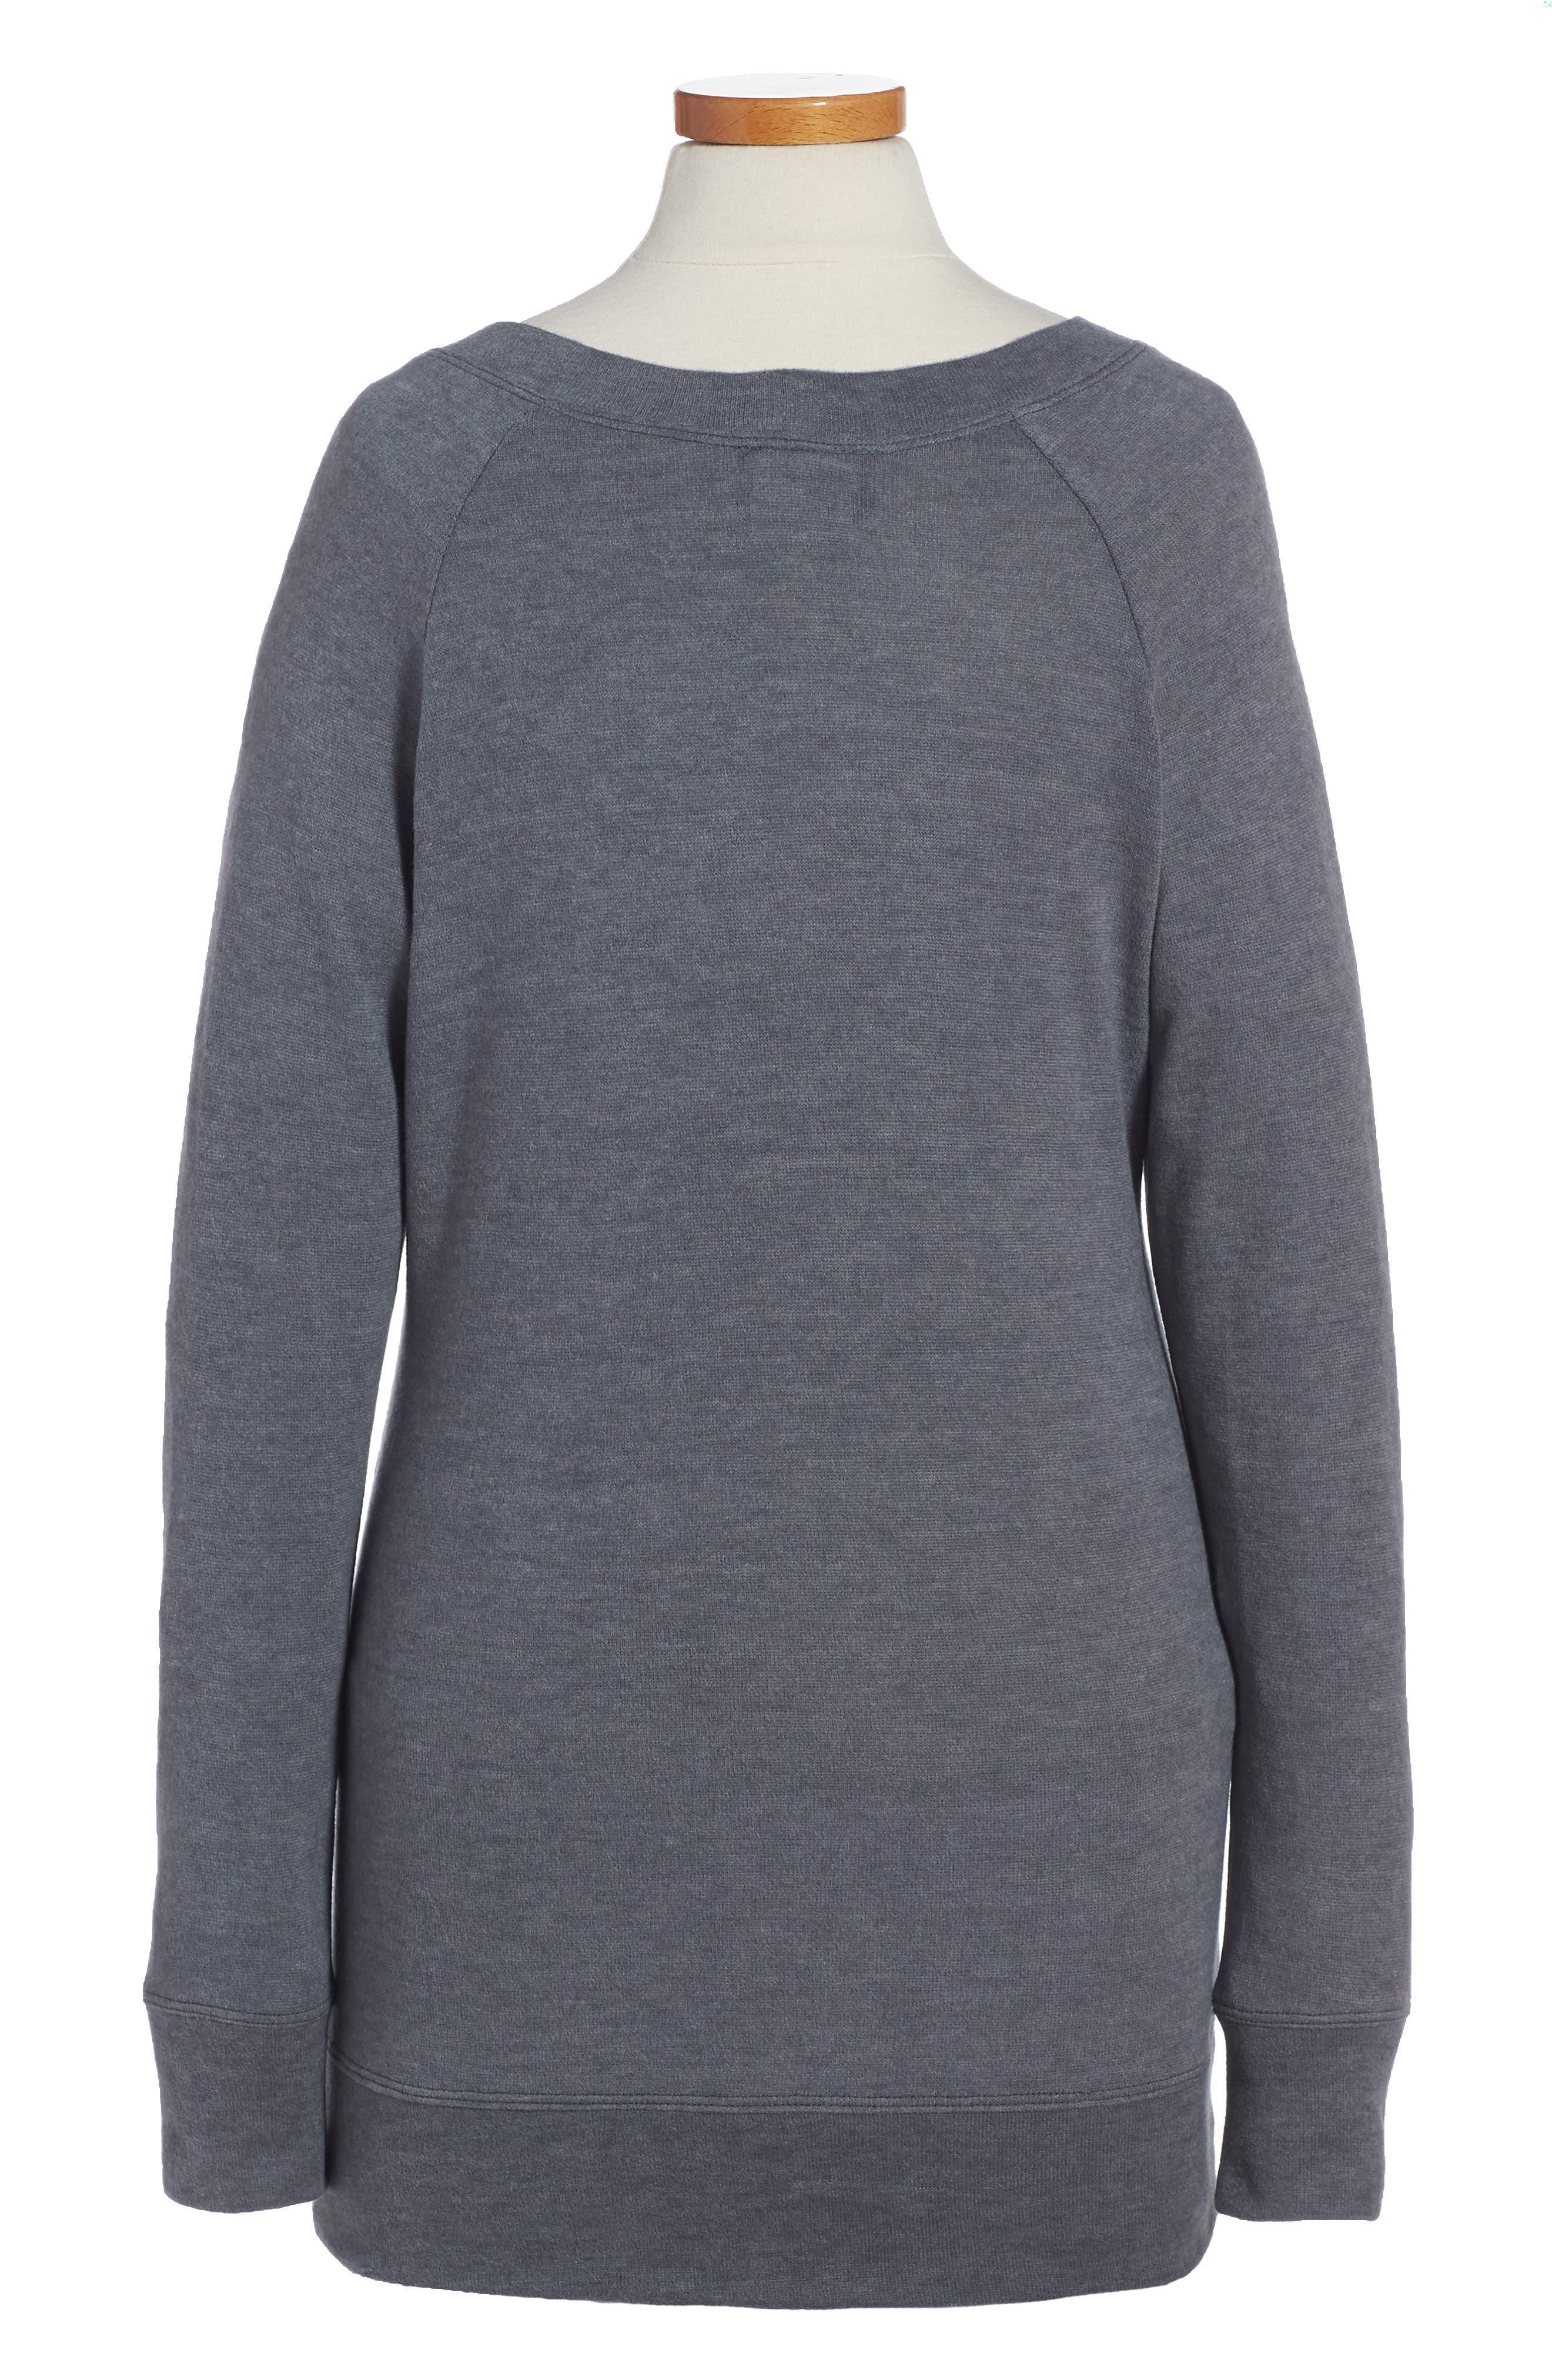 Sweatshirt Dress,                             Alternate thumbnail 2, color,                             Grey